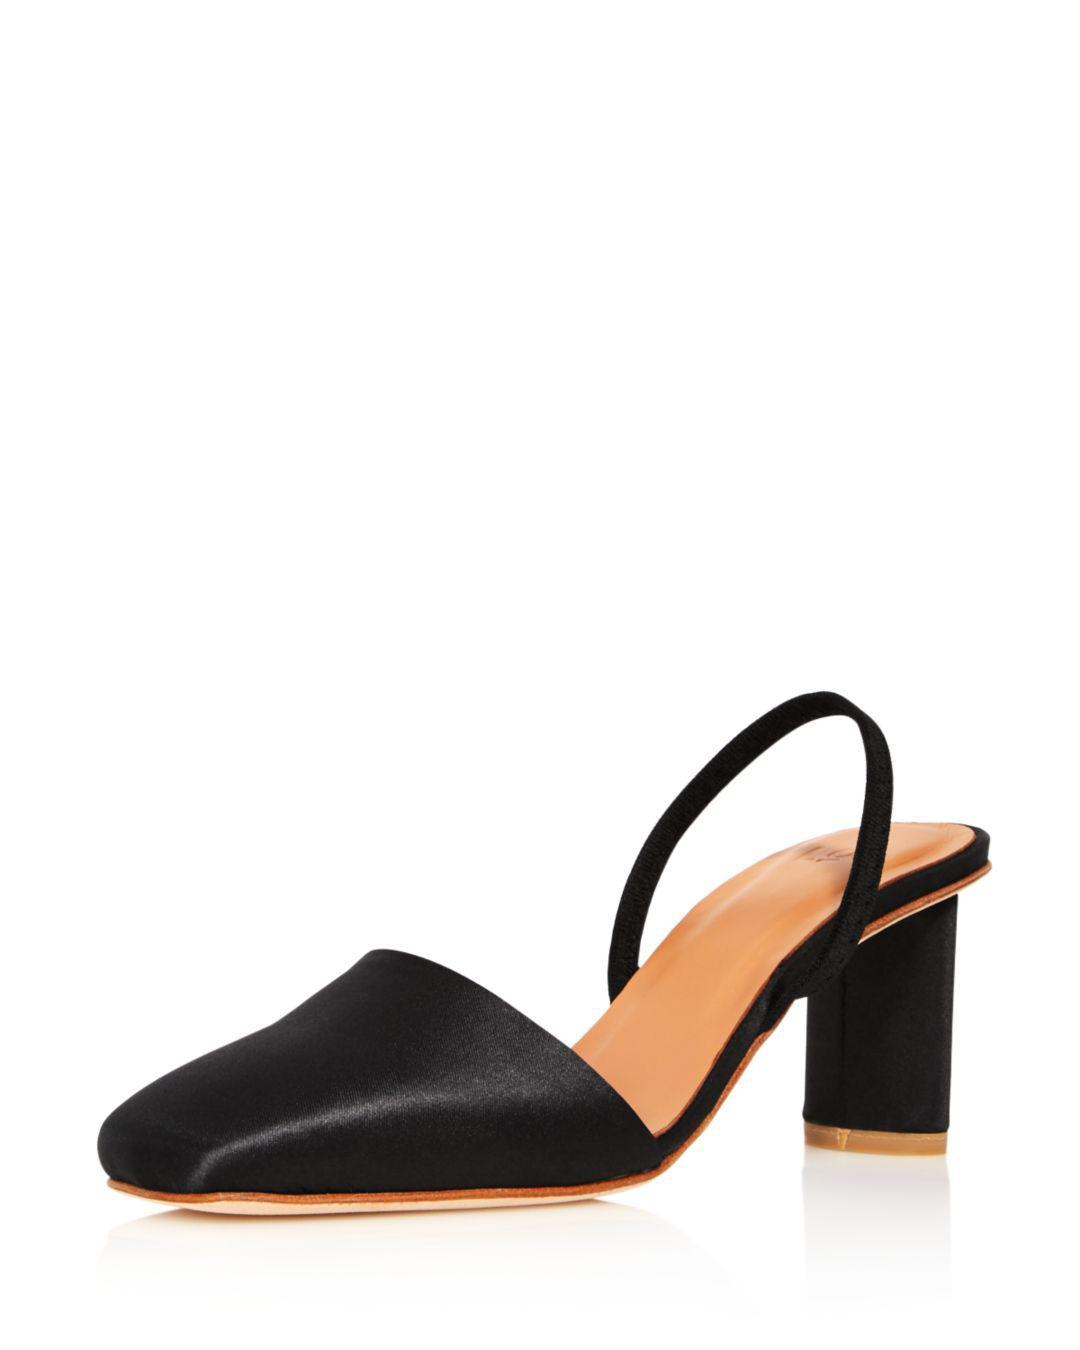 168ca55c6df Loq womens felipa square toe slingback mid heel satin pumps jpg 1080x1350 Square  toe sling back